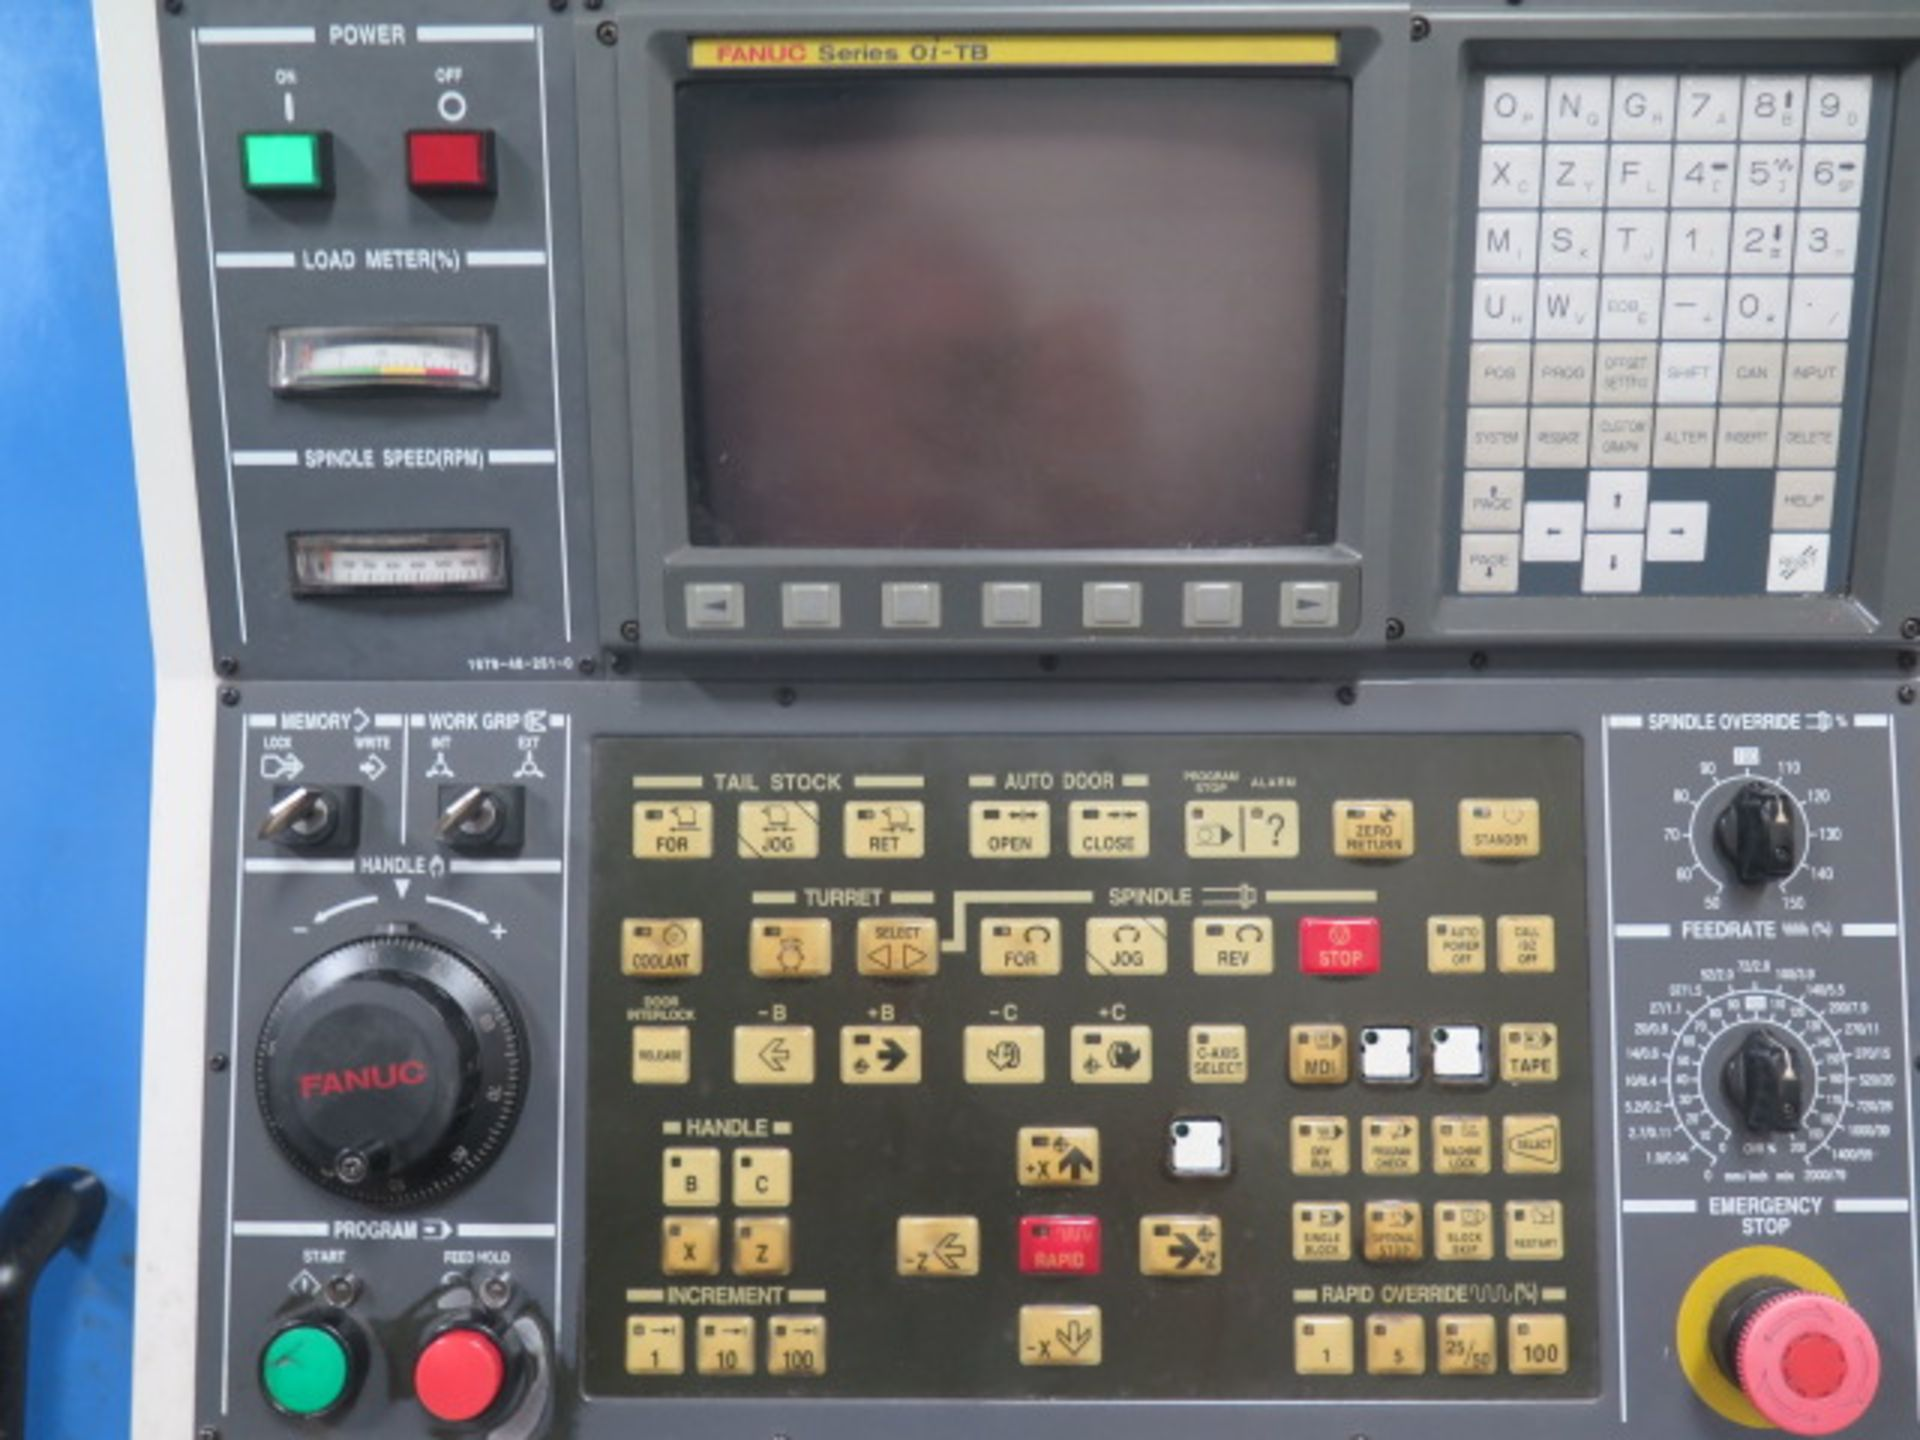 2004 Kia Super KIA Turn 15 CNC Turning Center s/n SKT150905 w/ Fanuc Series 0i-TB Contrs, SOLD AS IS - Image 6 of 16